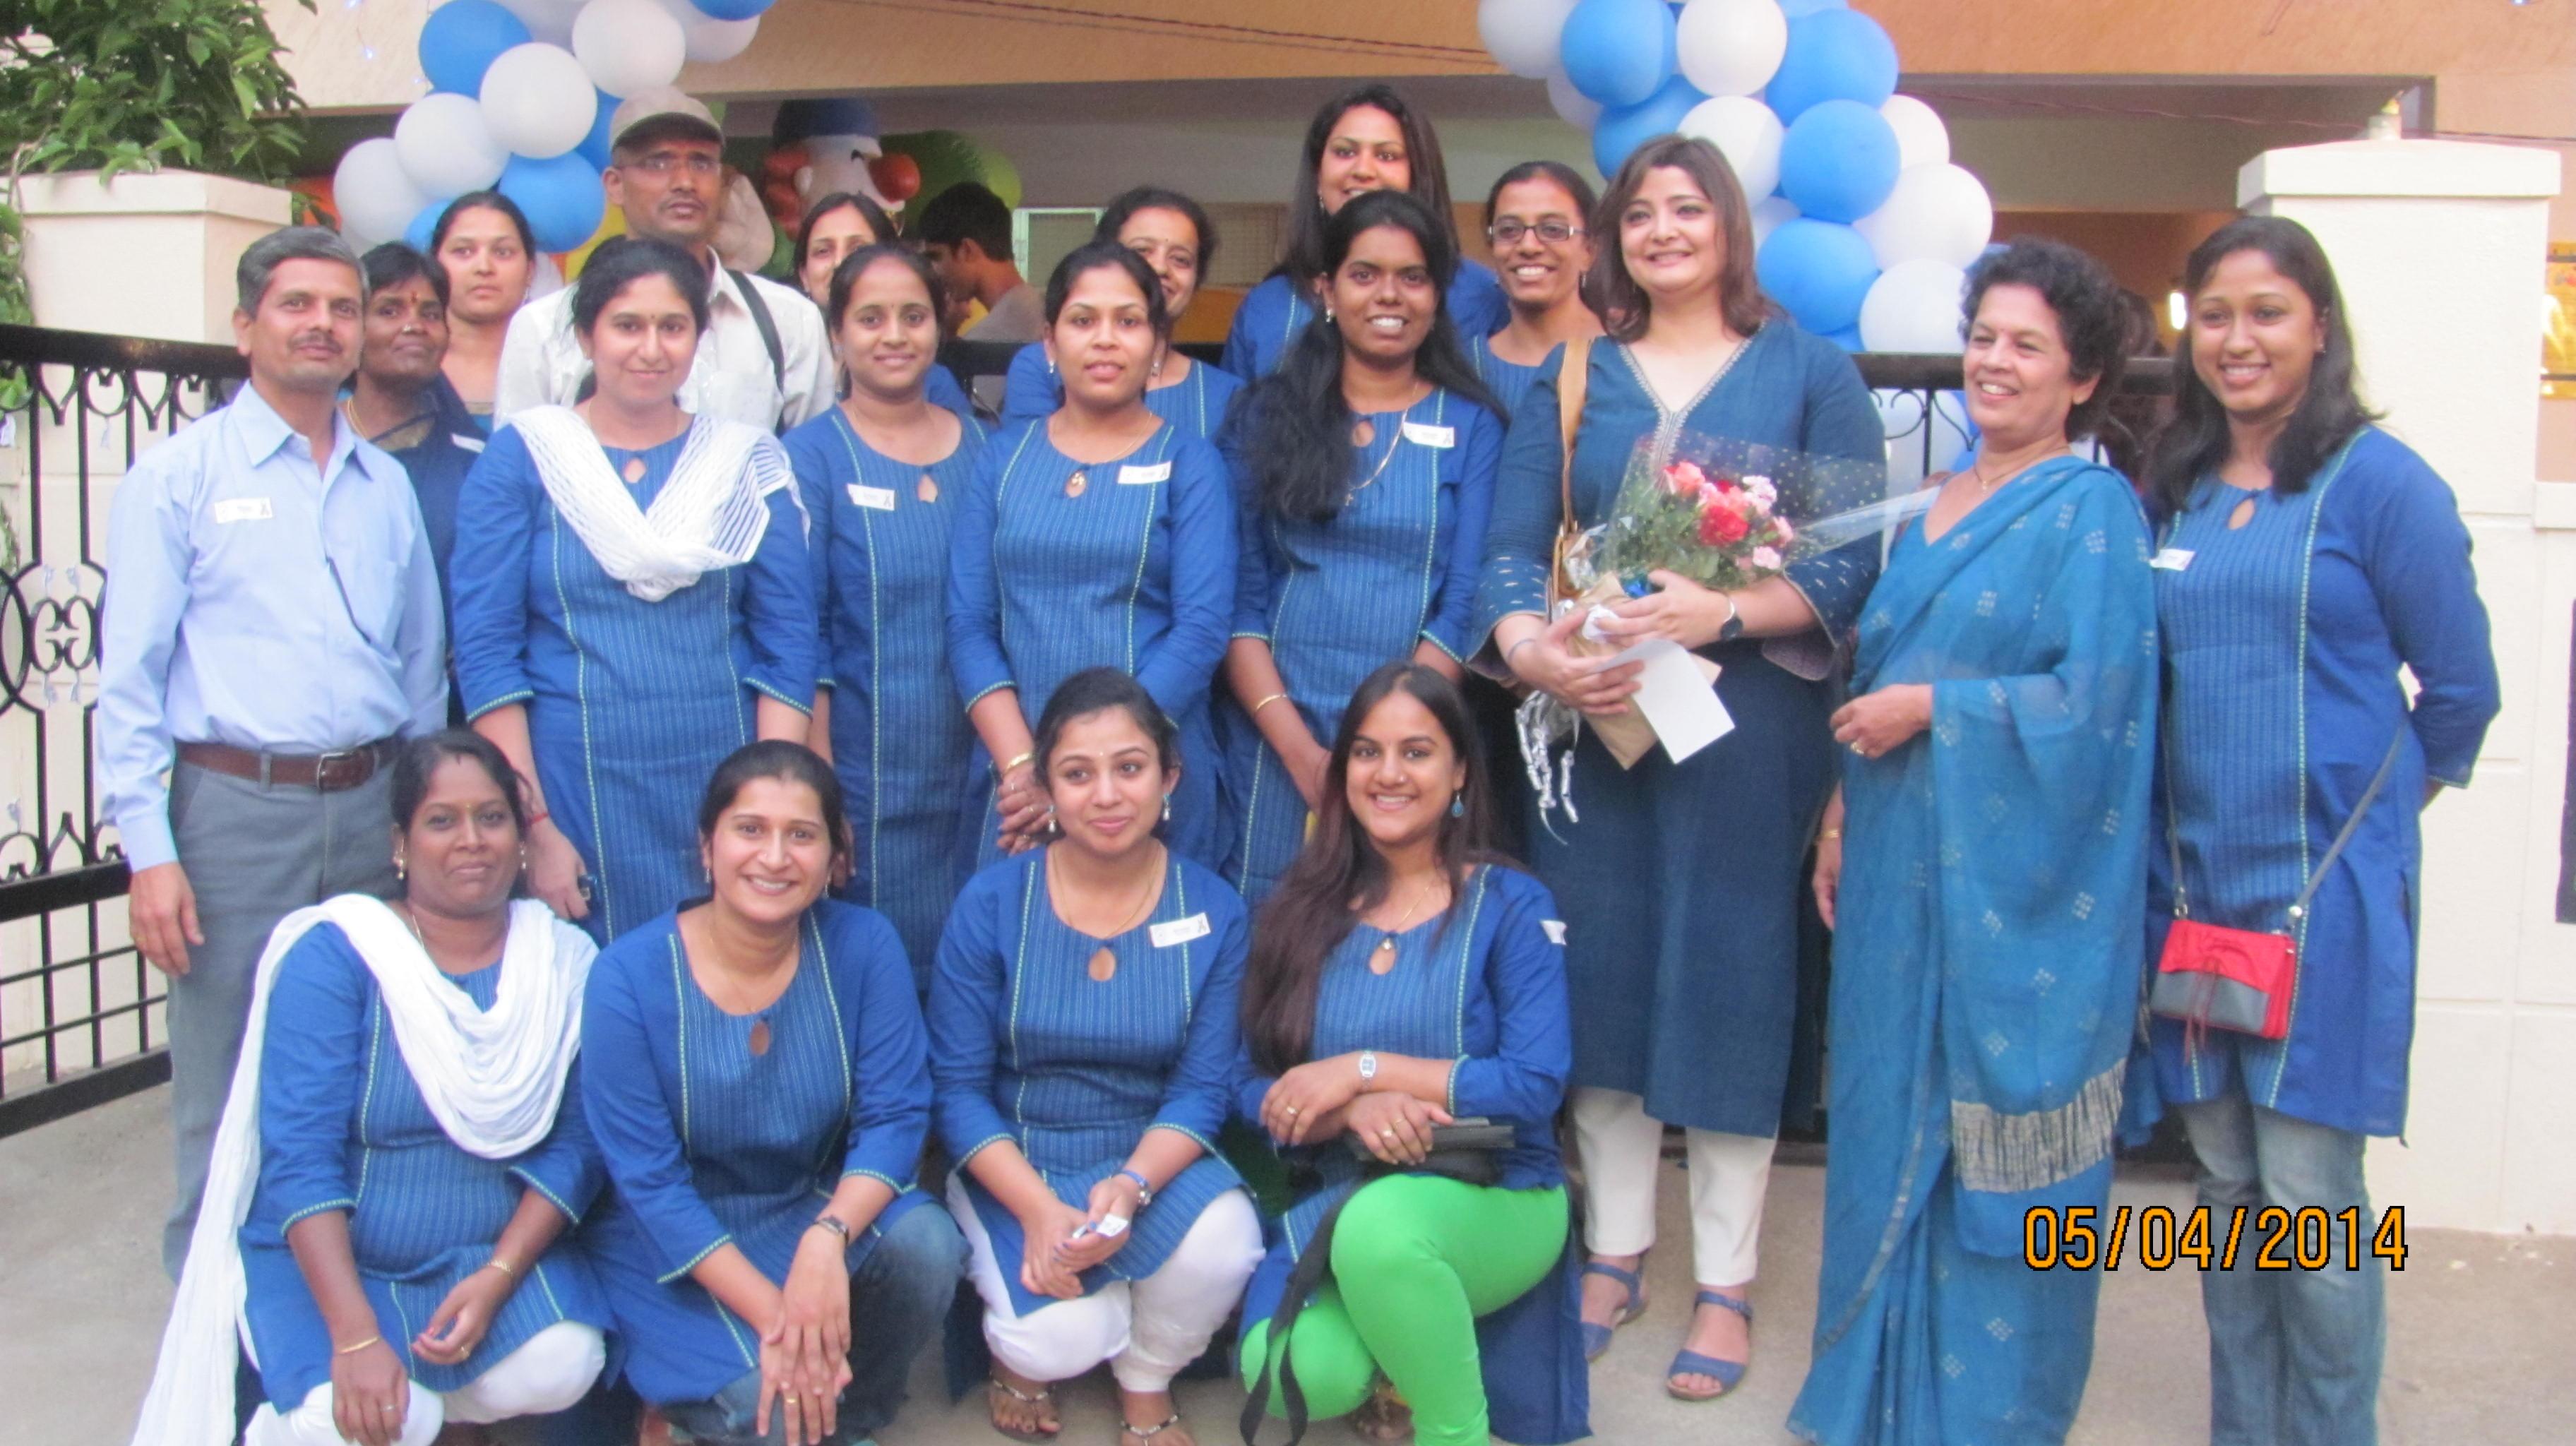 Com DEALL team in Blue